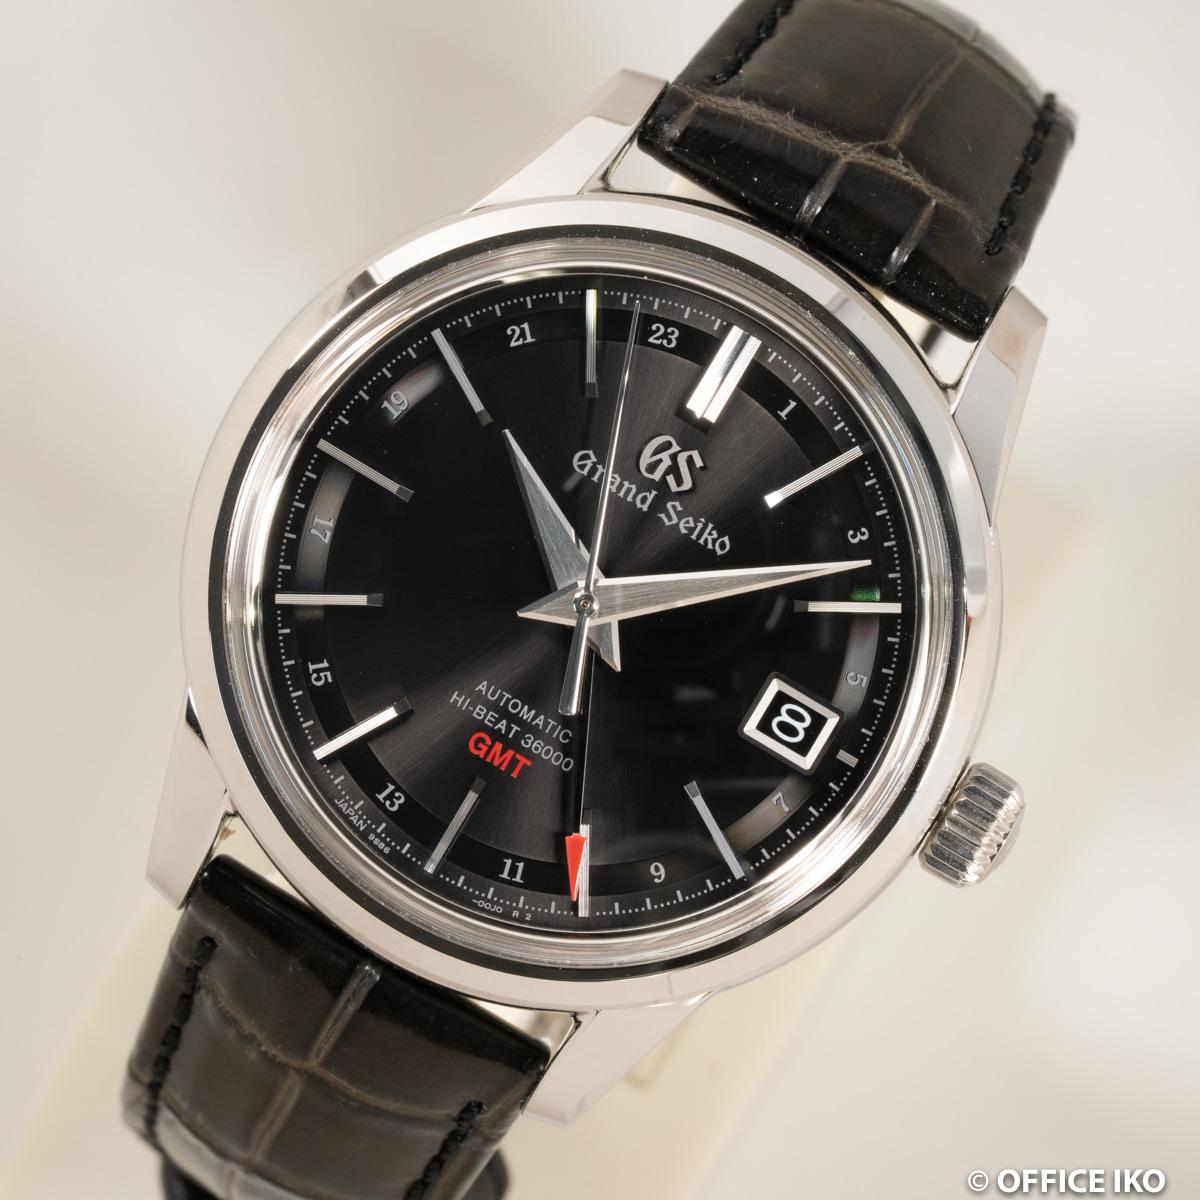 best website 70b26 f8ad6 セイコー] SEIKO 腕時計 グランドセイコー SBGJ219 GMT ...